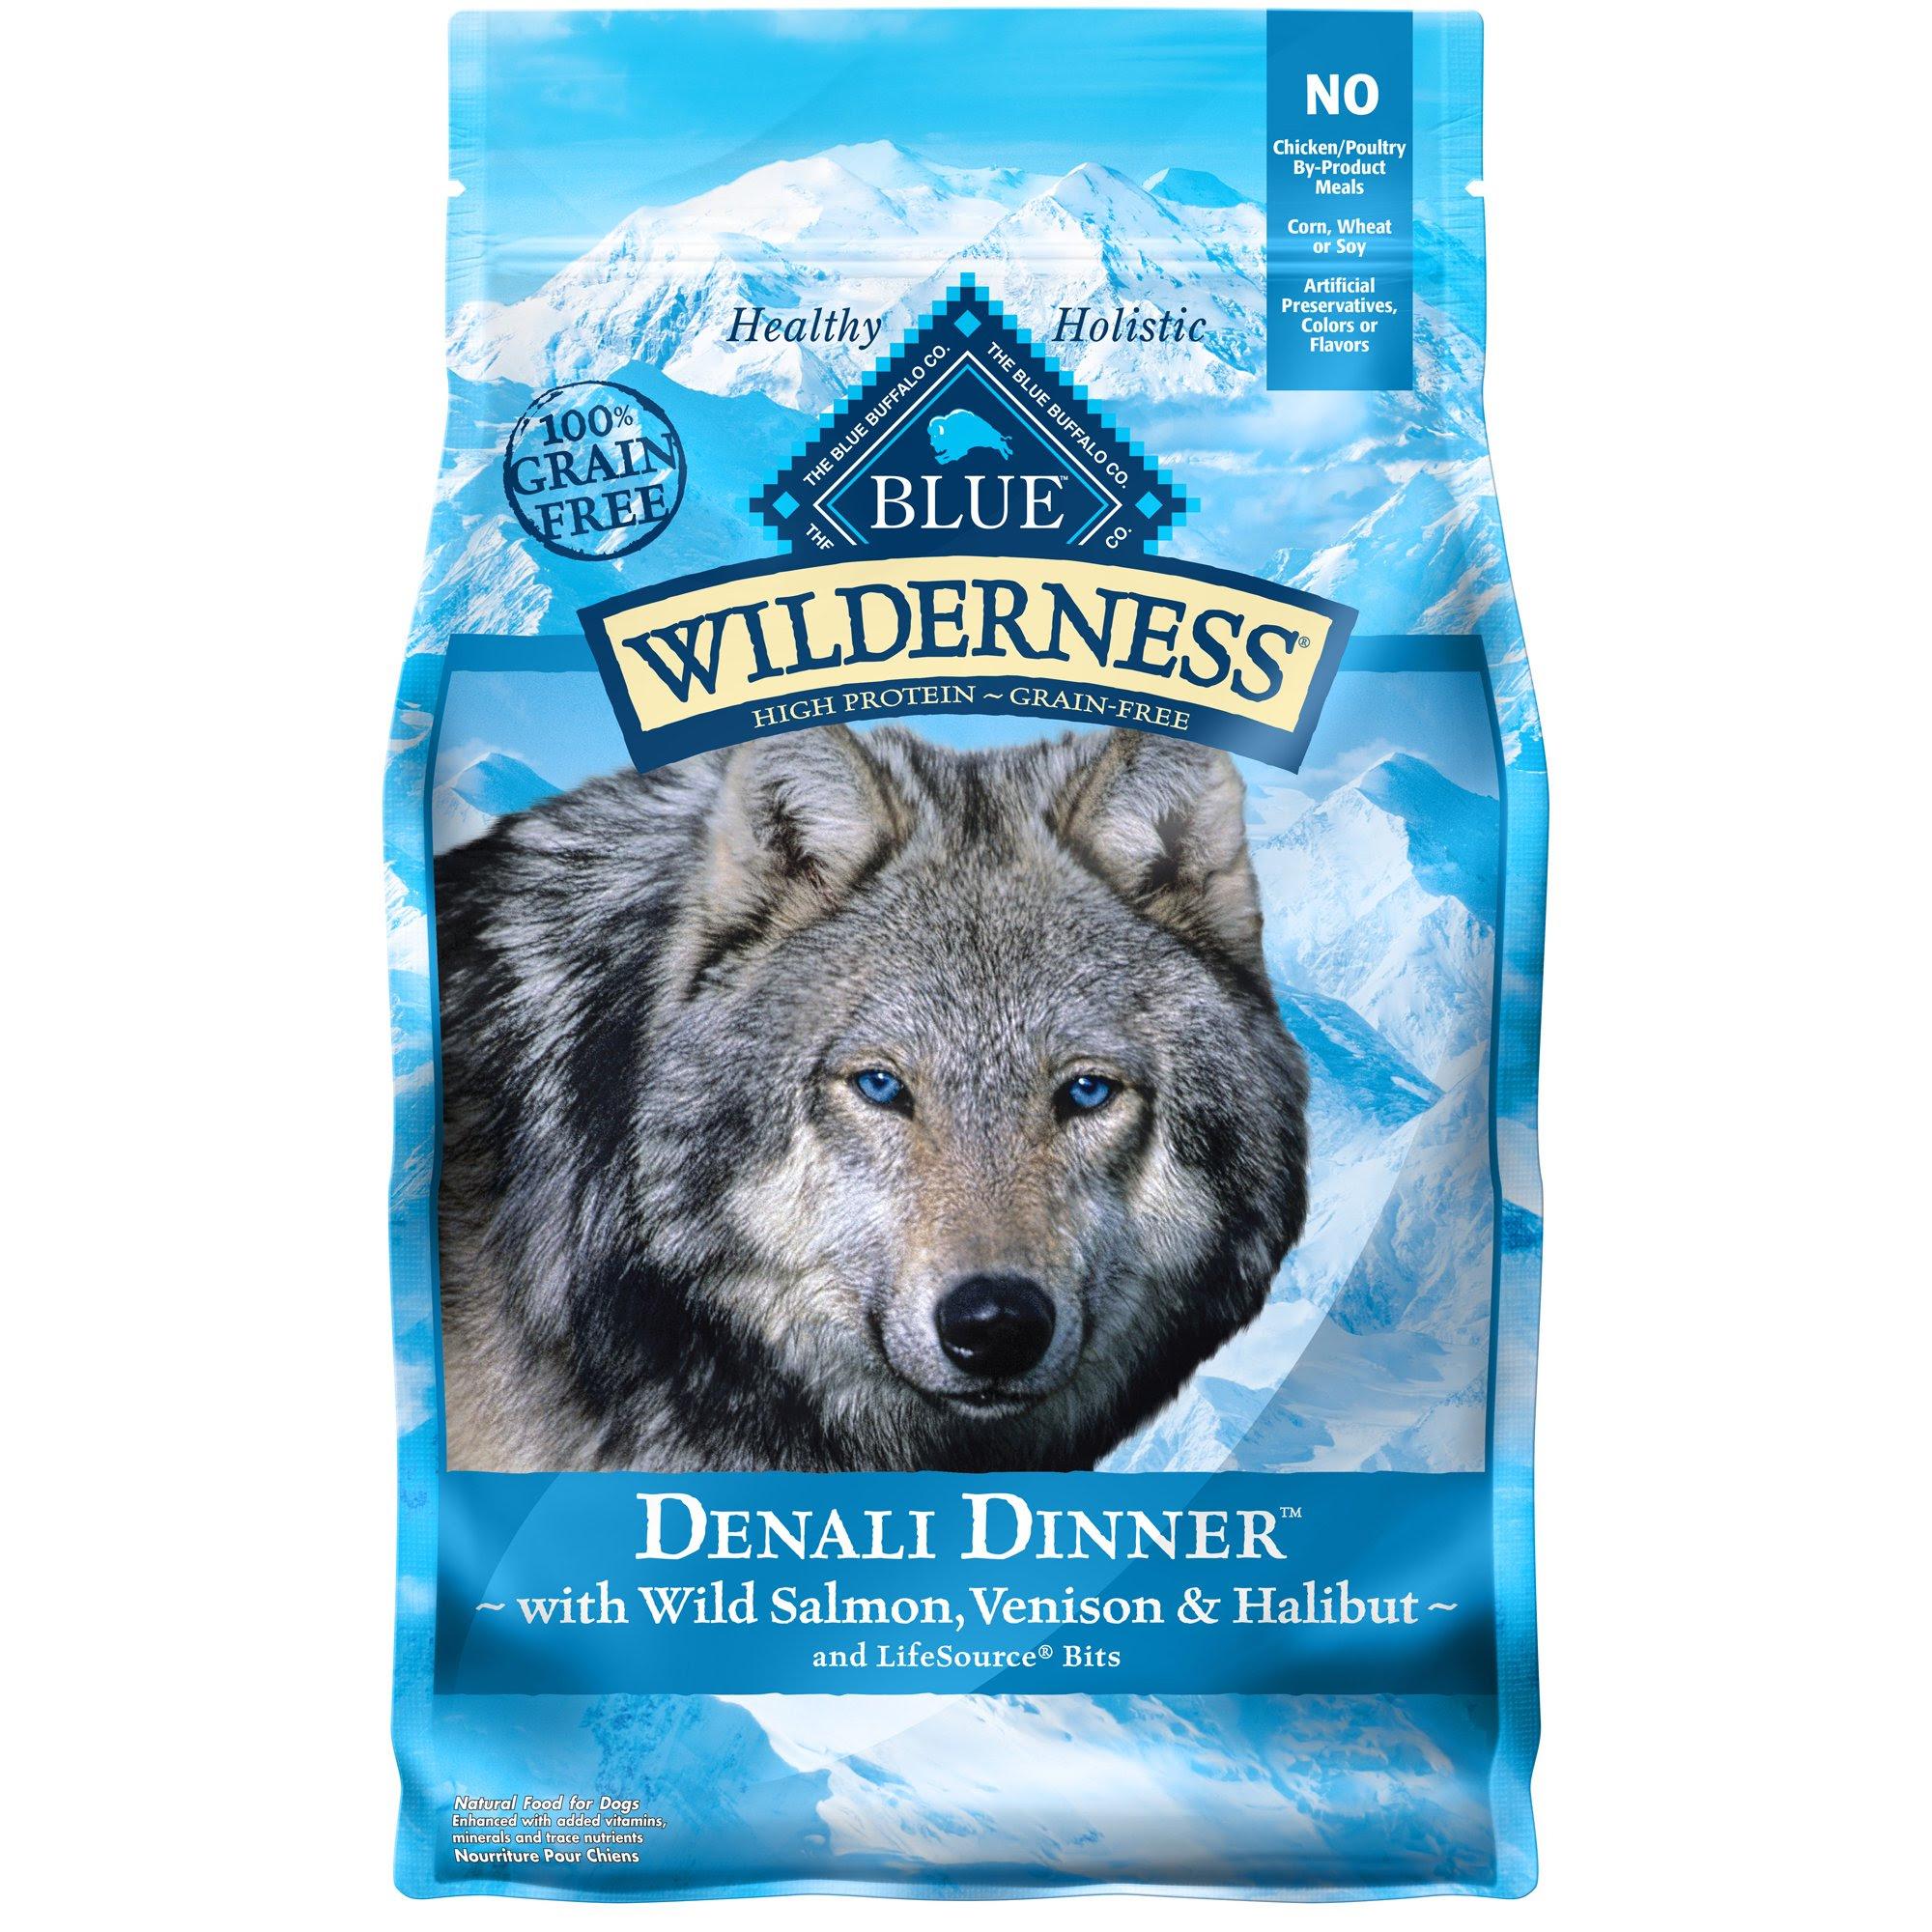 Blue Buffalo Wilderness Denali Dinner Dry Dog Food | Petco